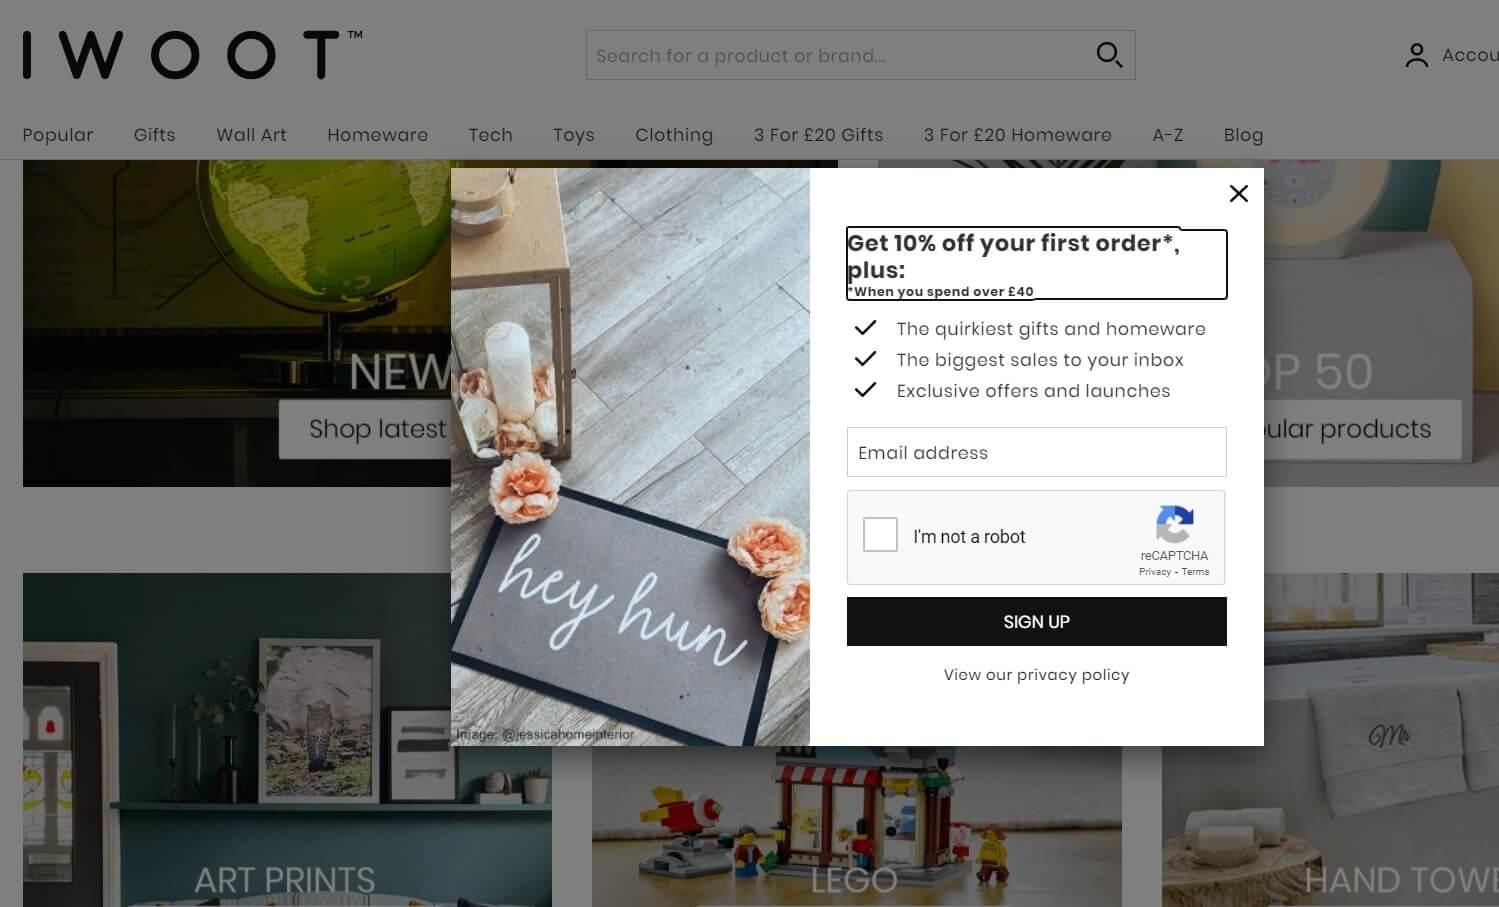 Engagement tactics for e-store